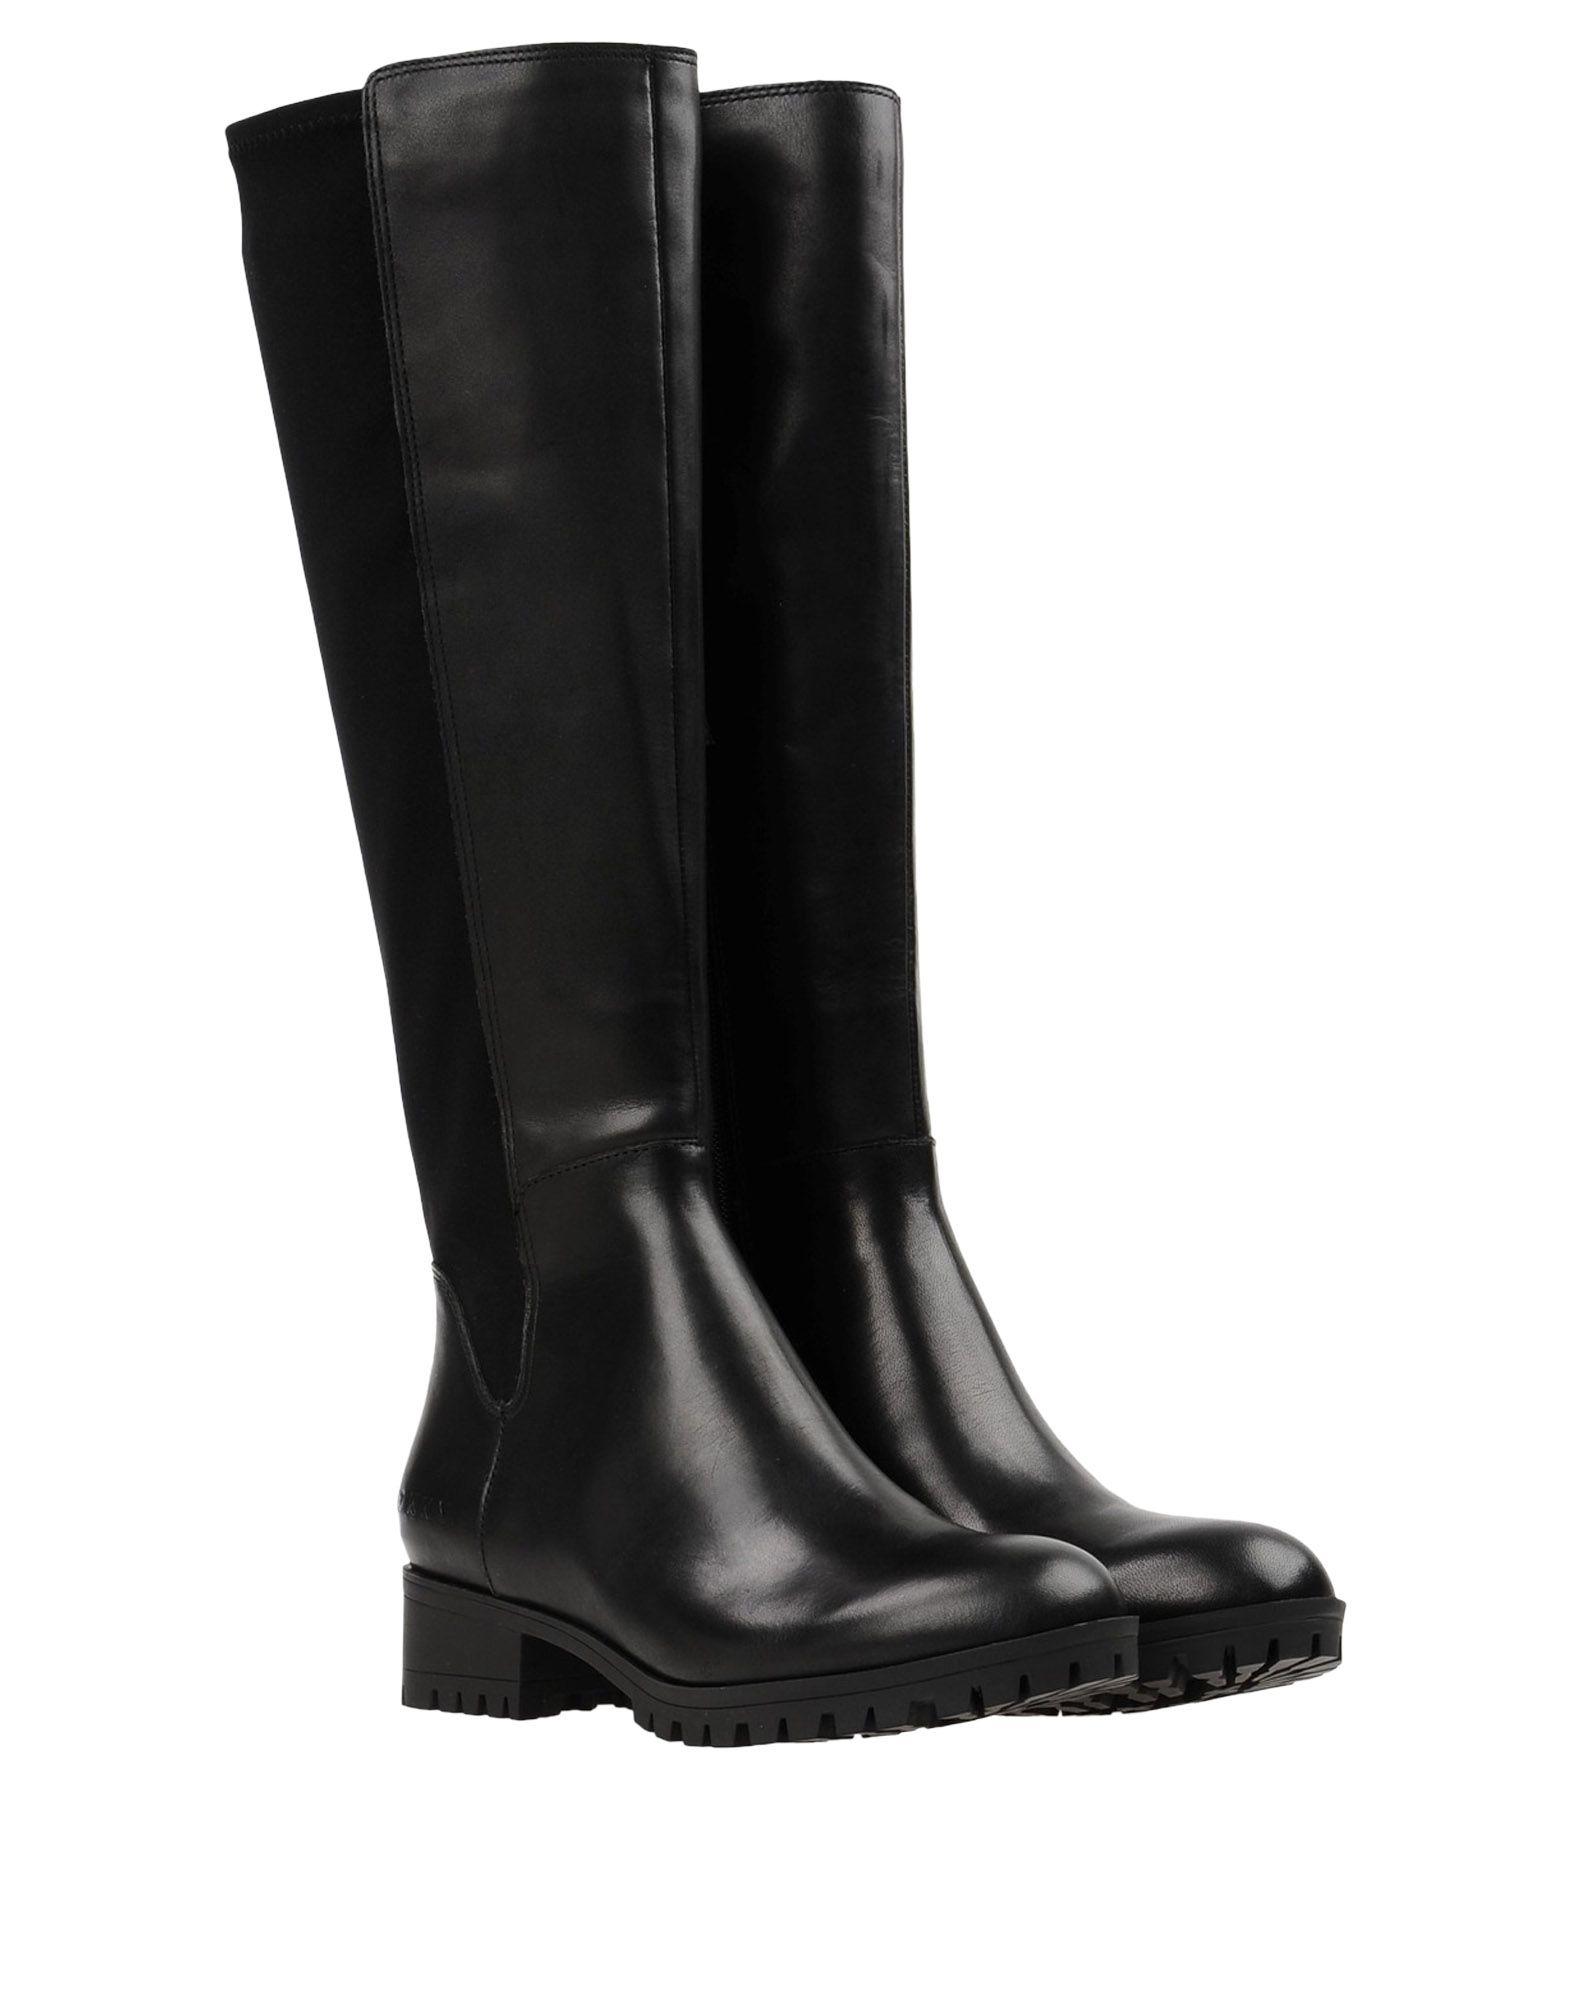 Stivali Dkny Waterproof Merona Knee High Boot - Donna - Acquista online su